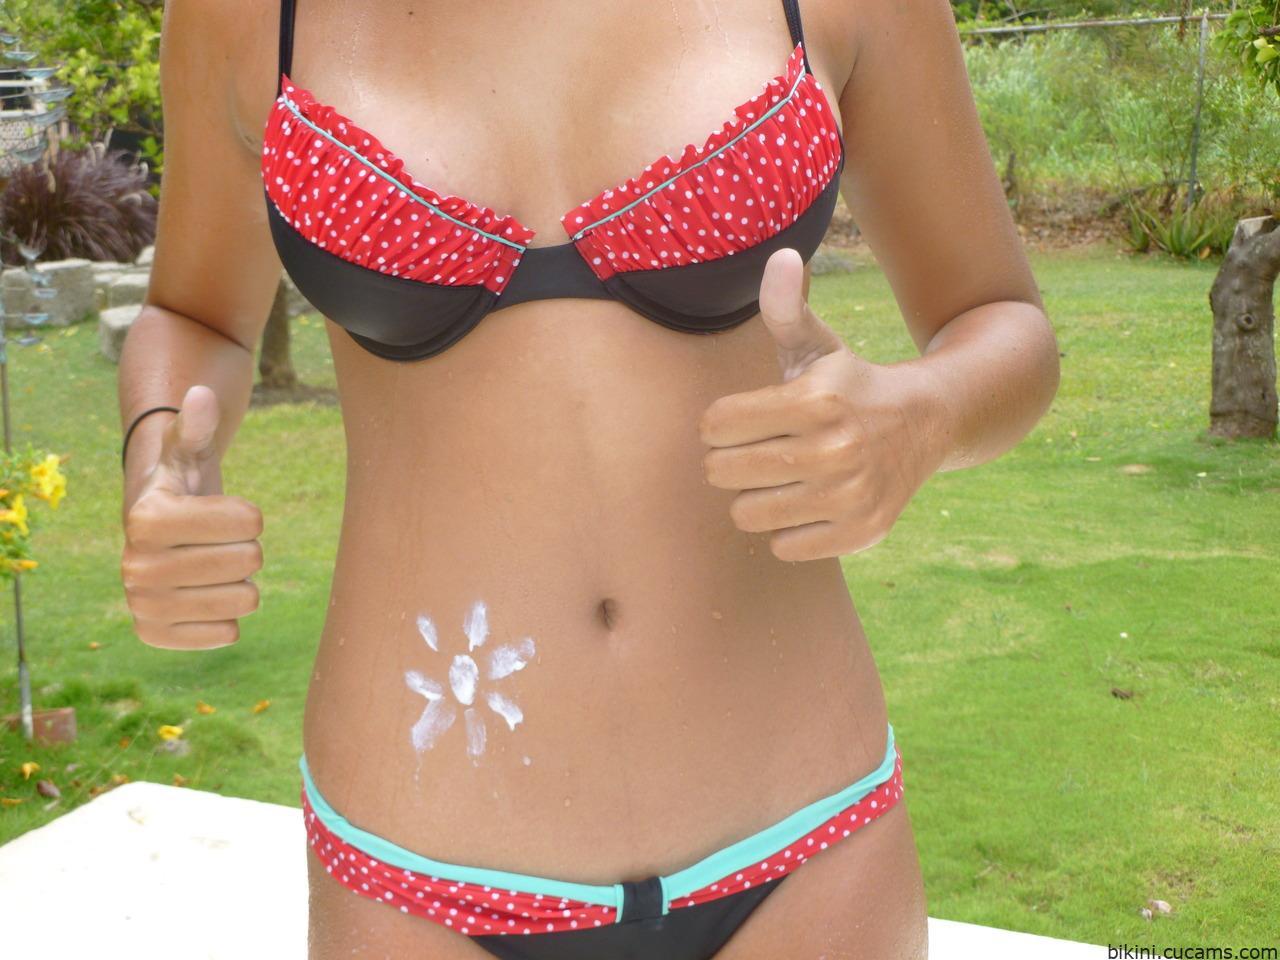 Bikini Soccer Plumber by bikini.cucams.com